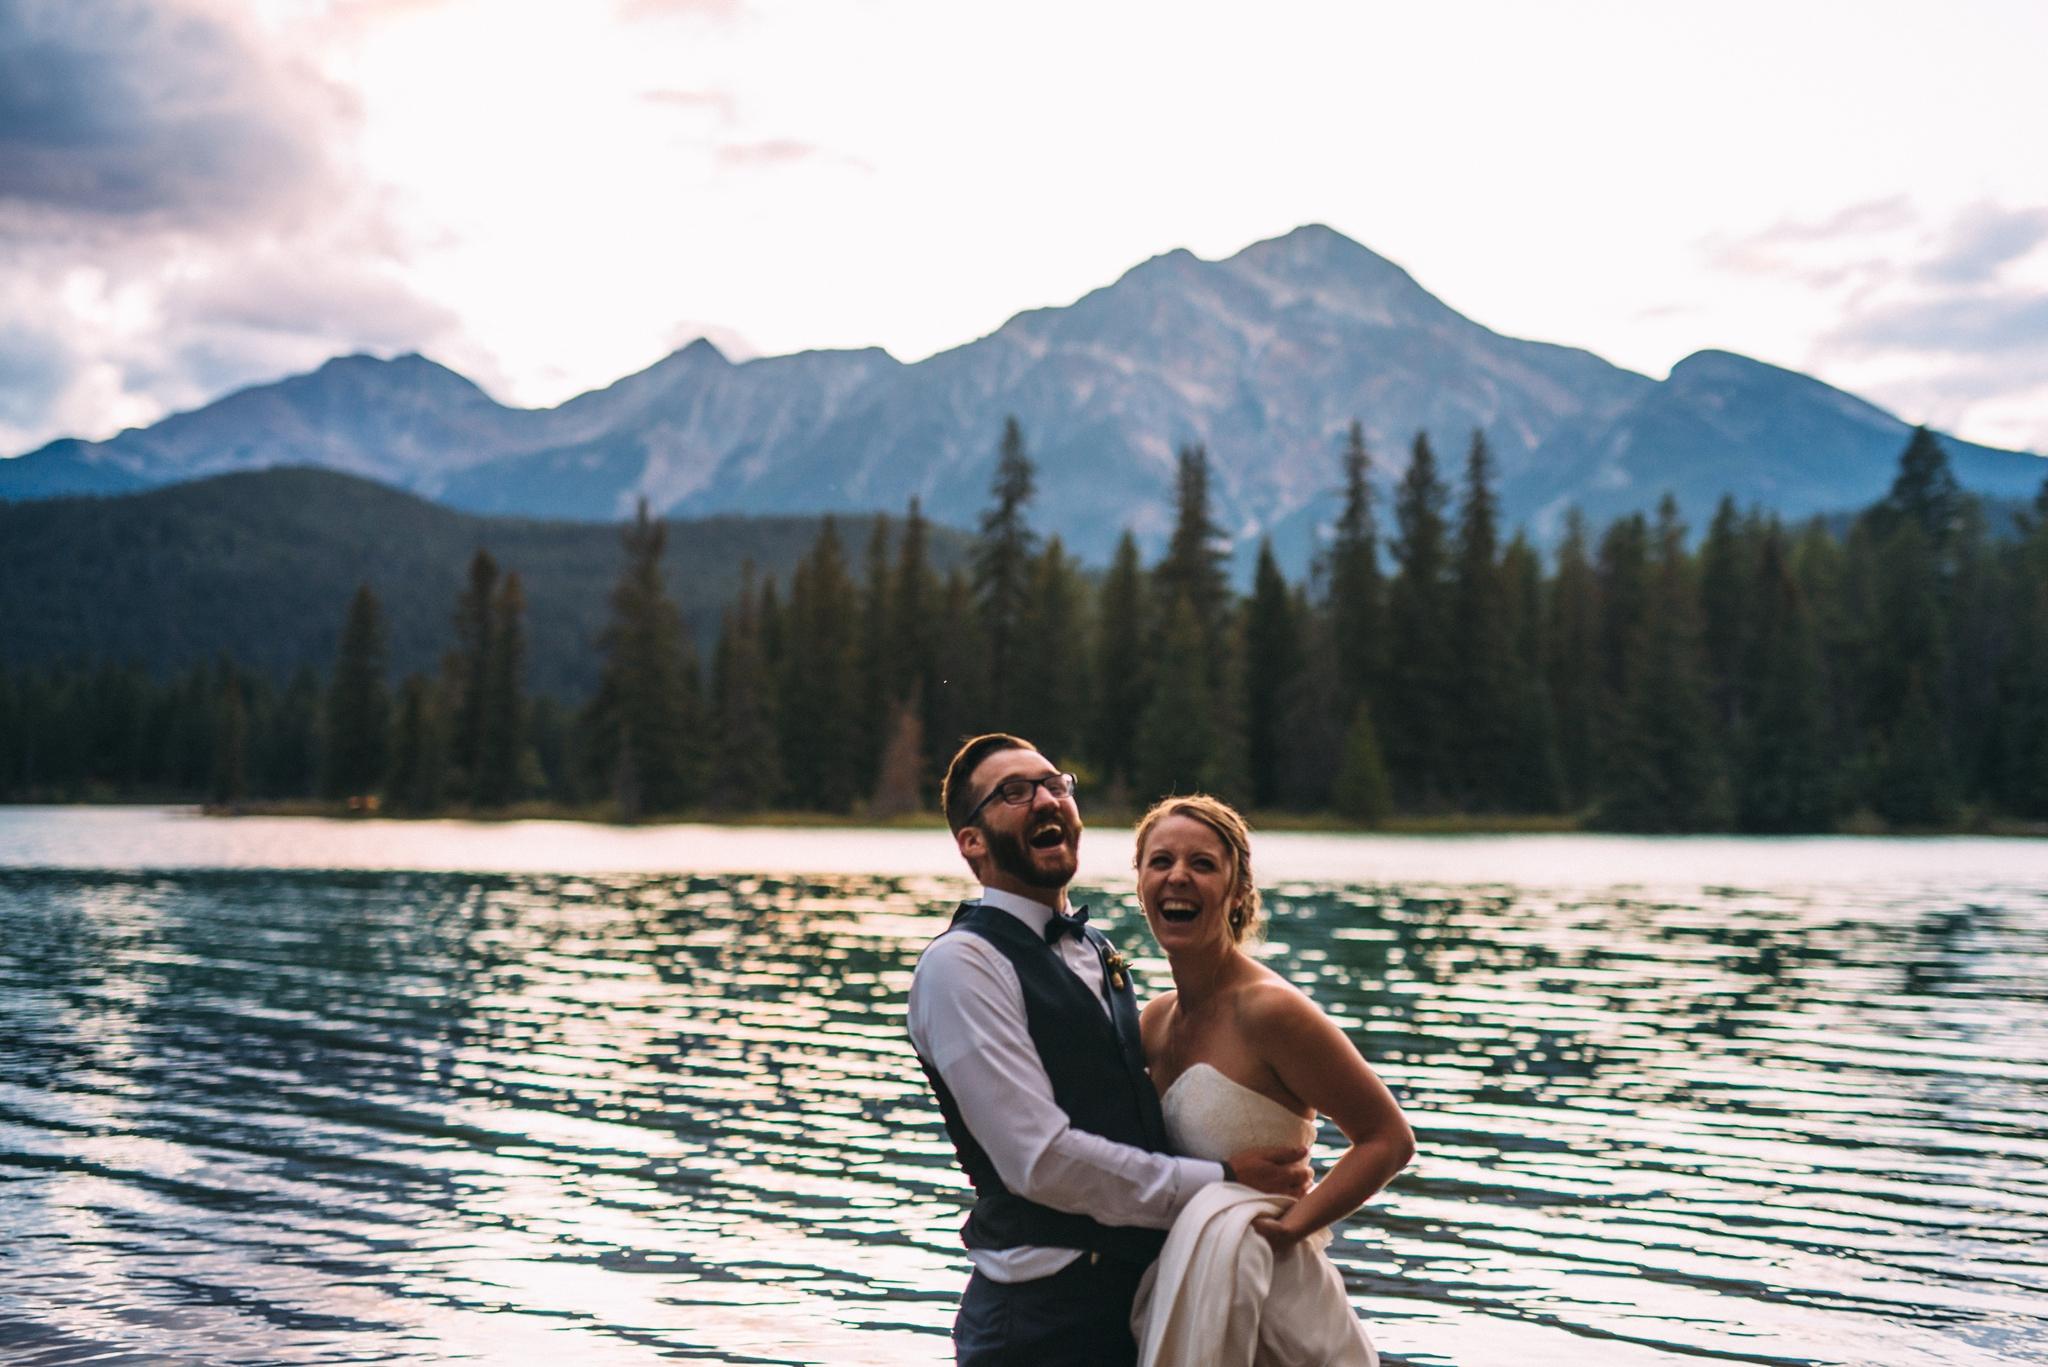 kaihla_tonai_intimate_wedding_elopement_photographer_2565